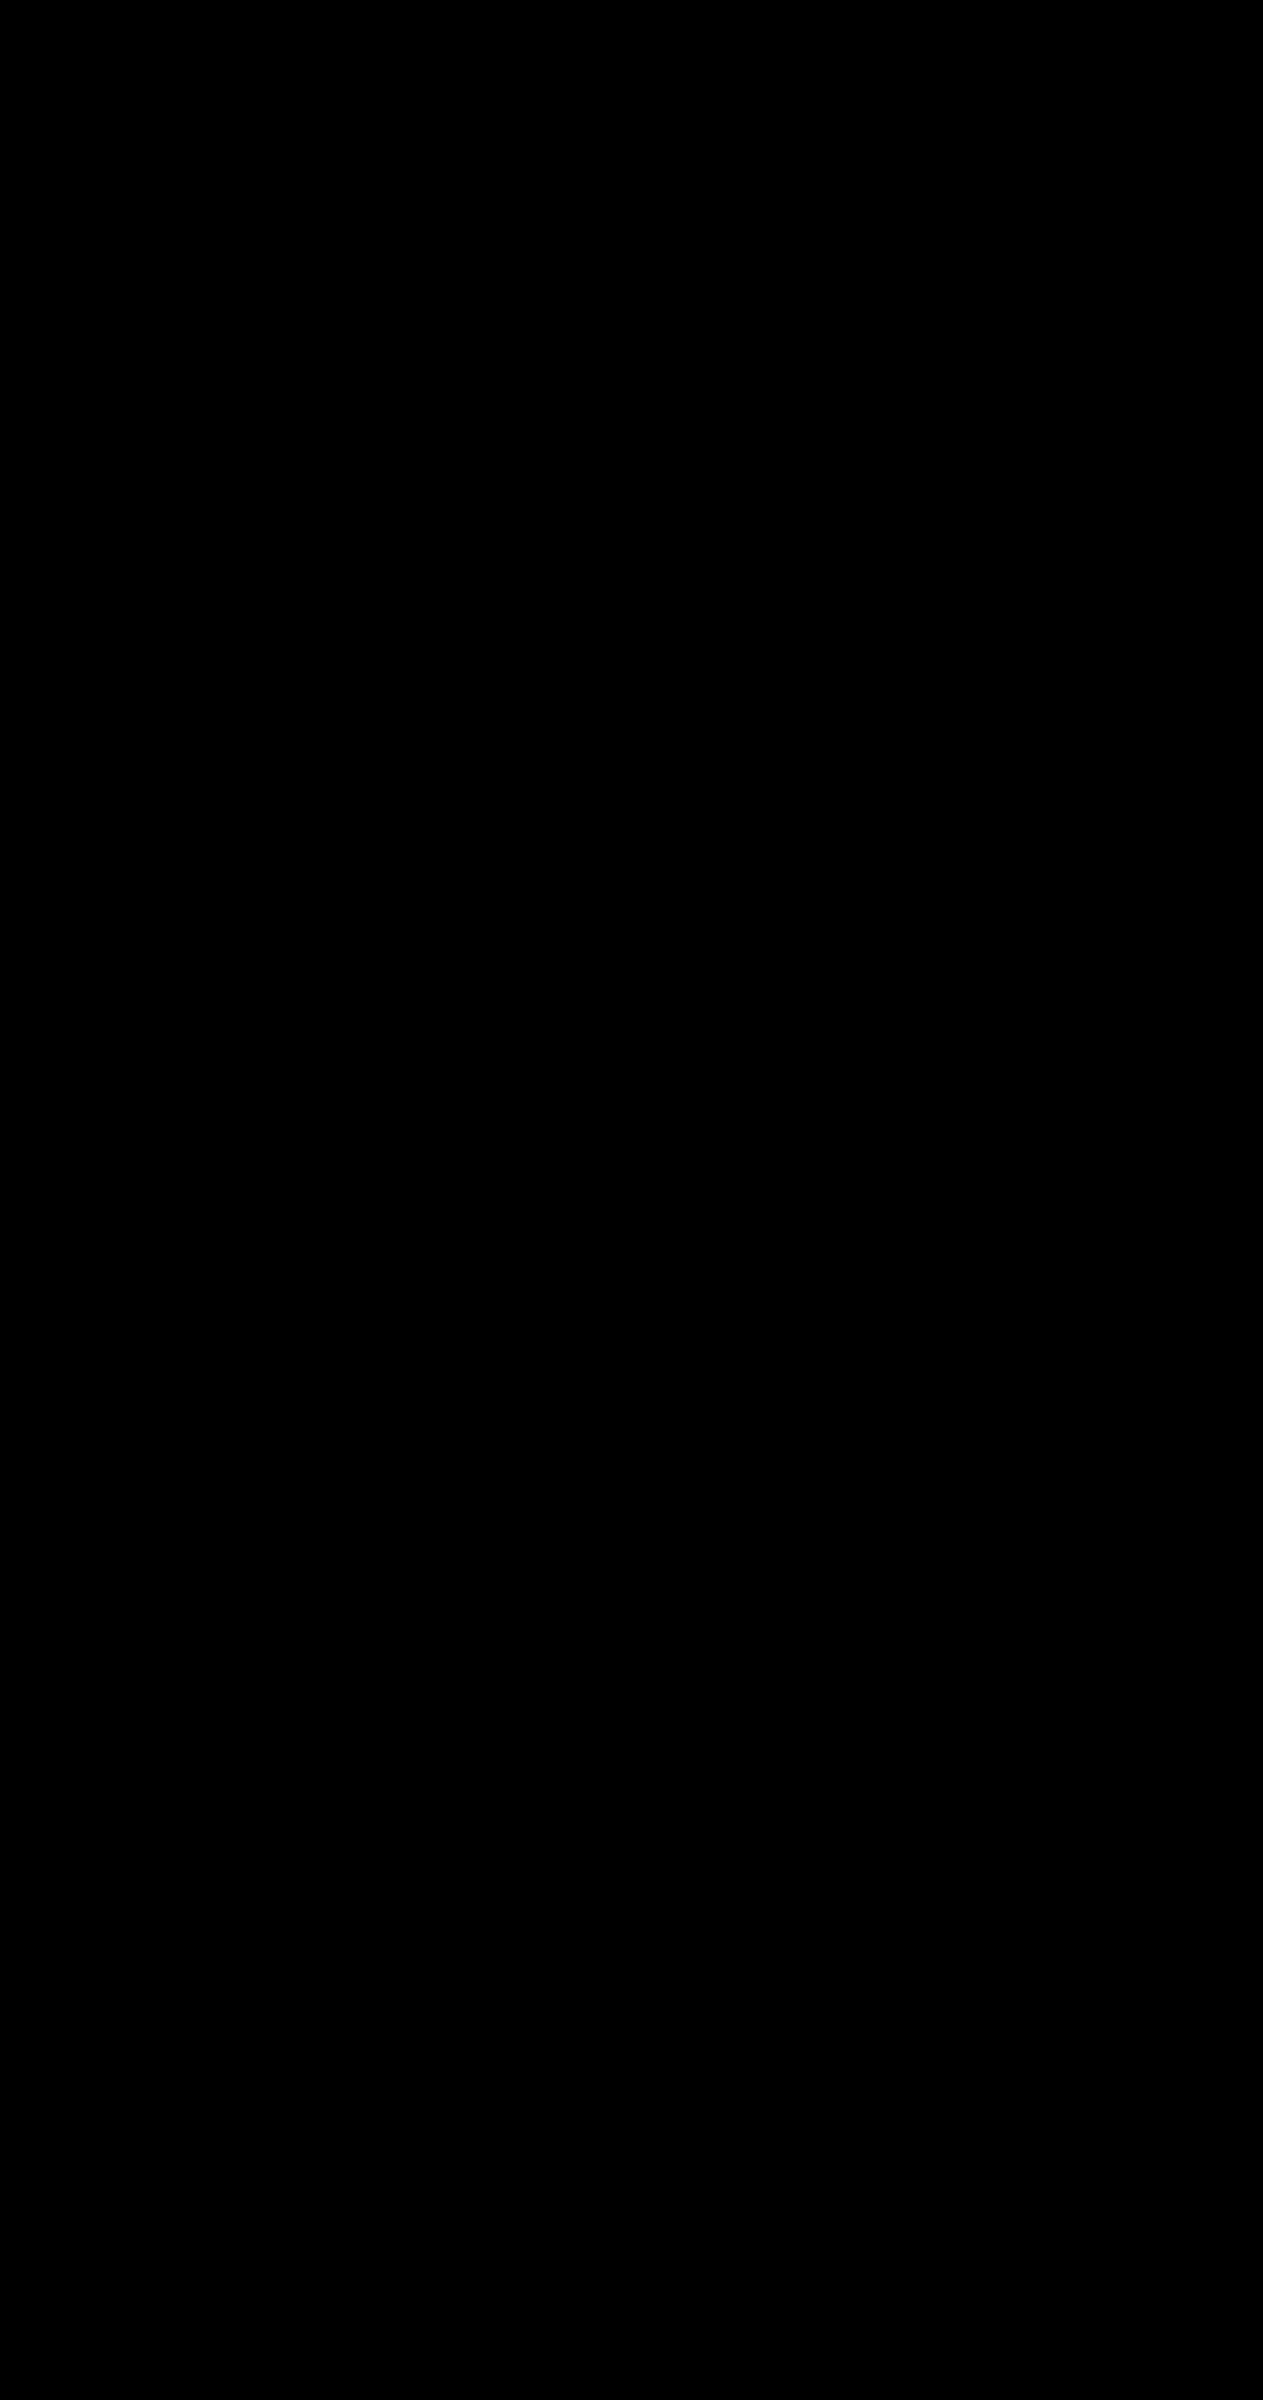 Cfl bulb silhouette big. Lamp clipart bilb